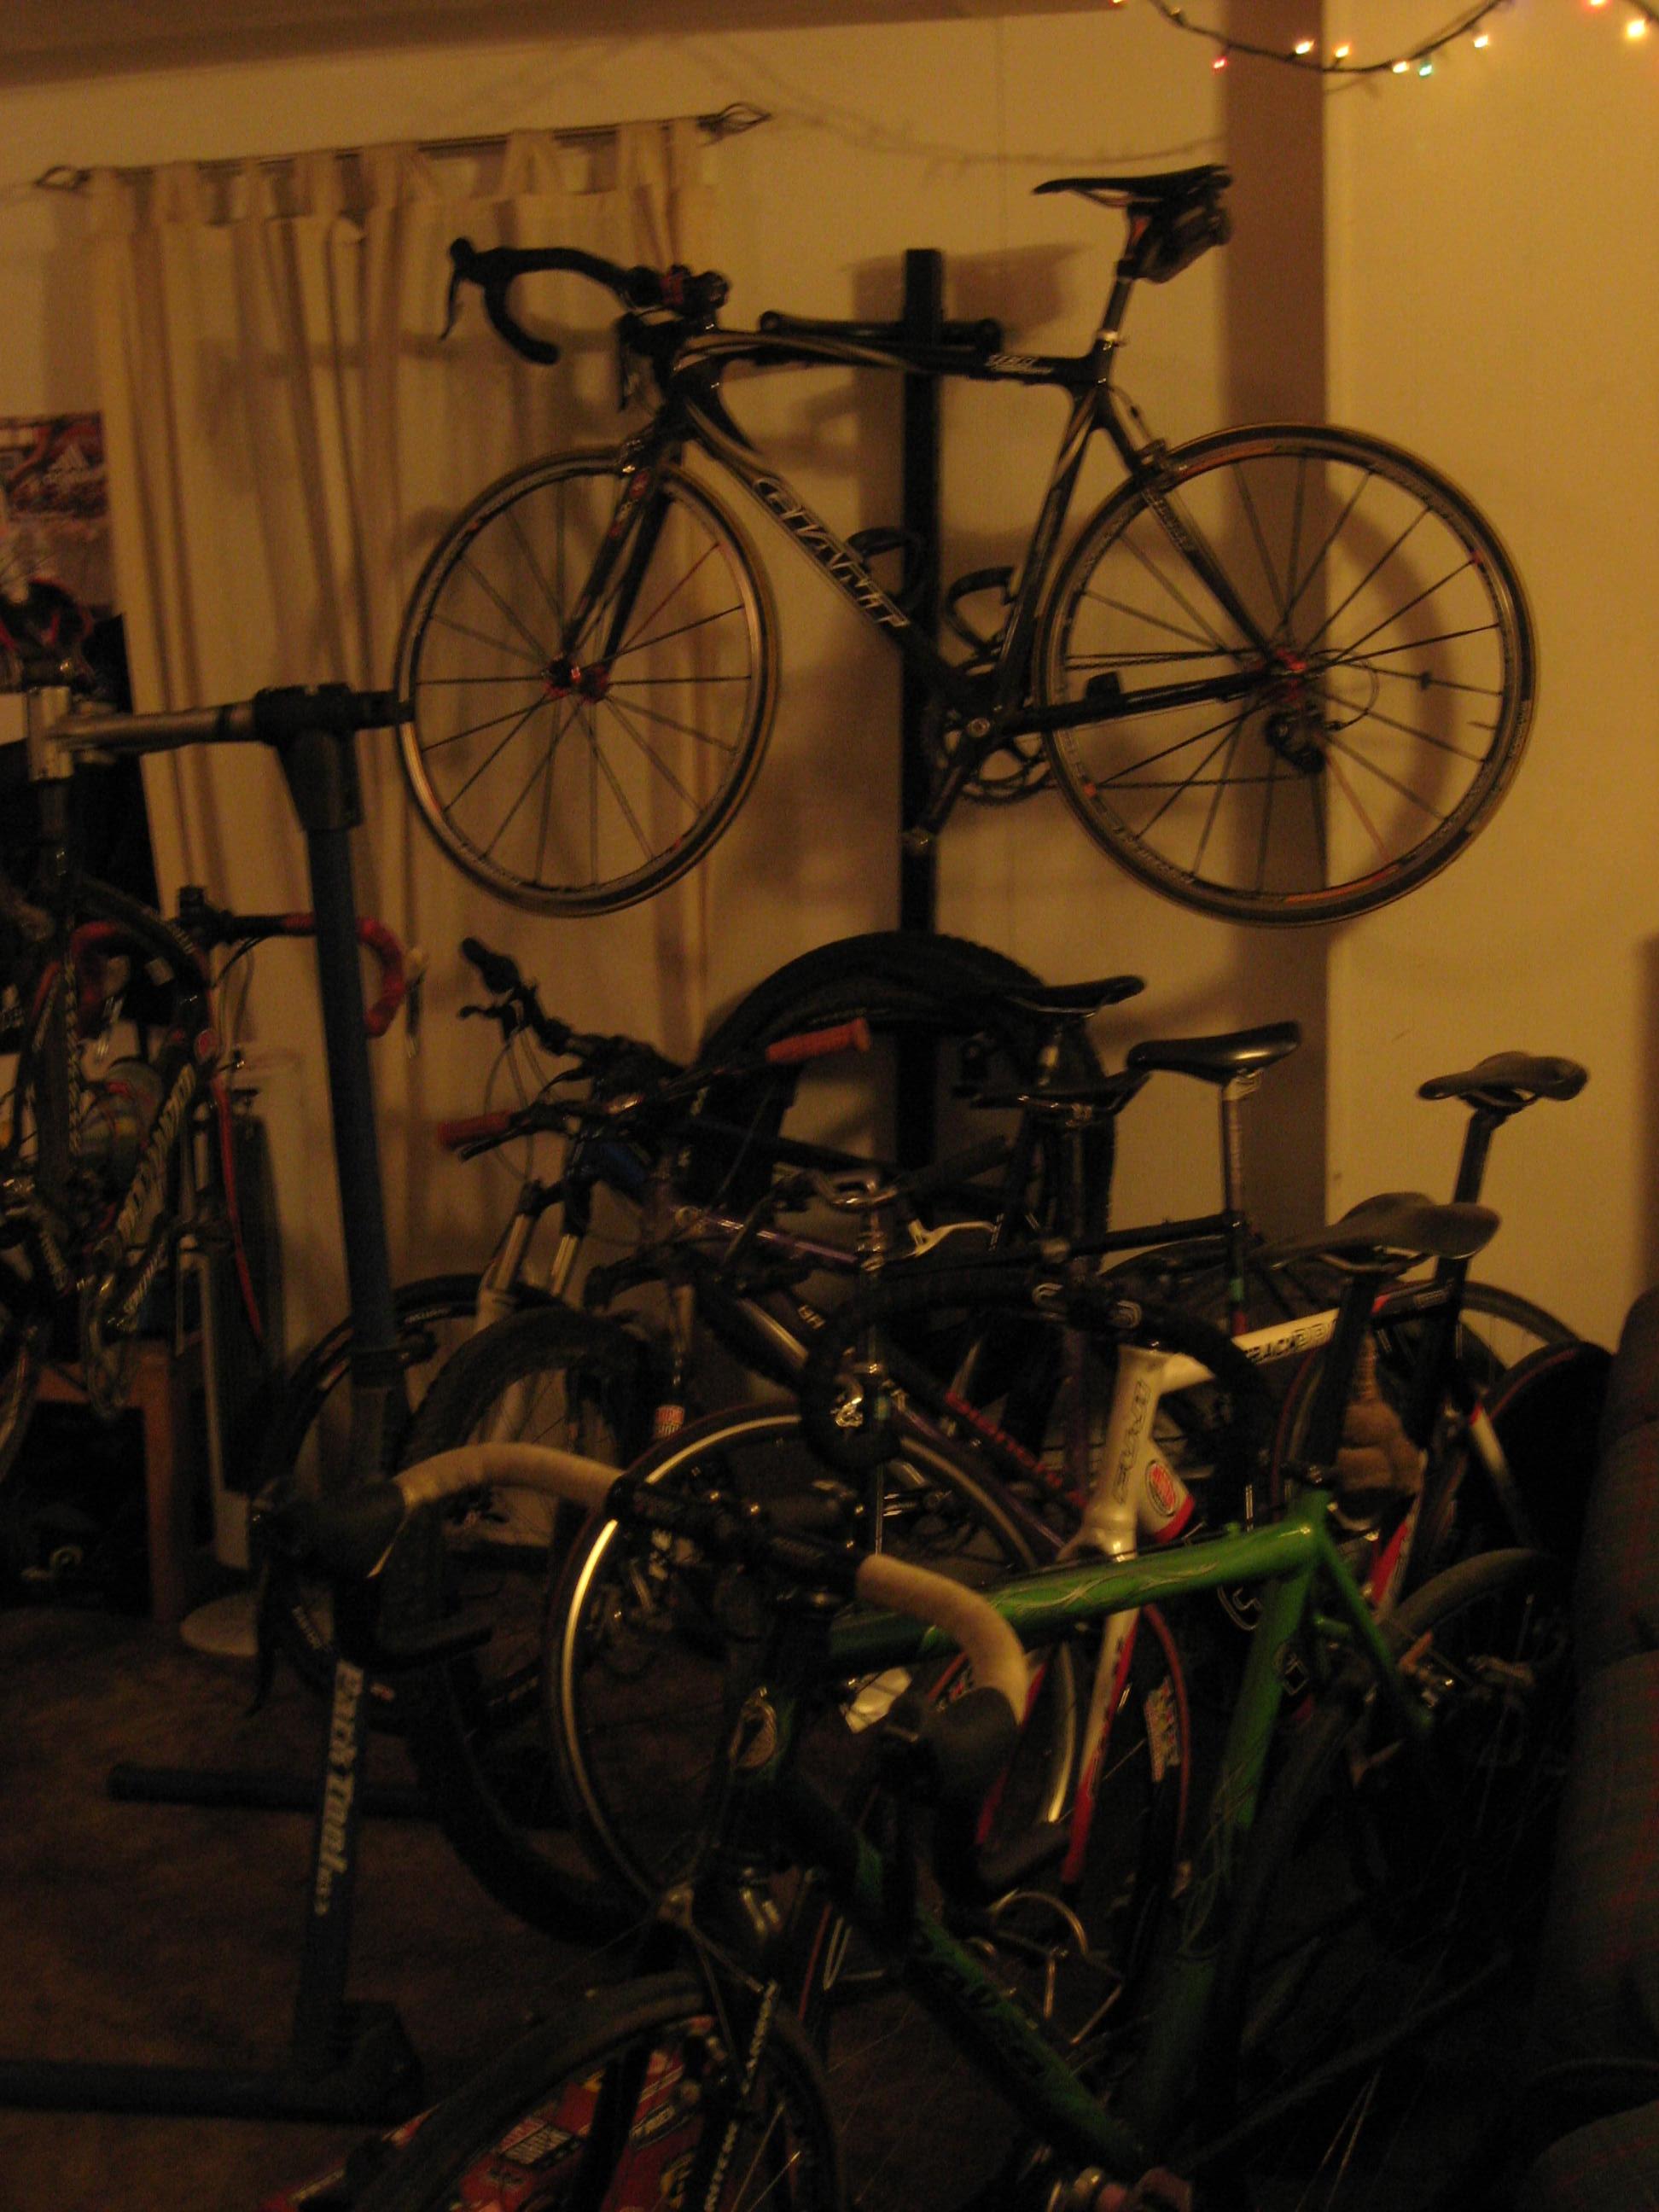 bikes-and-more-bikes-011